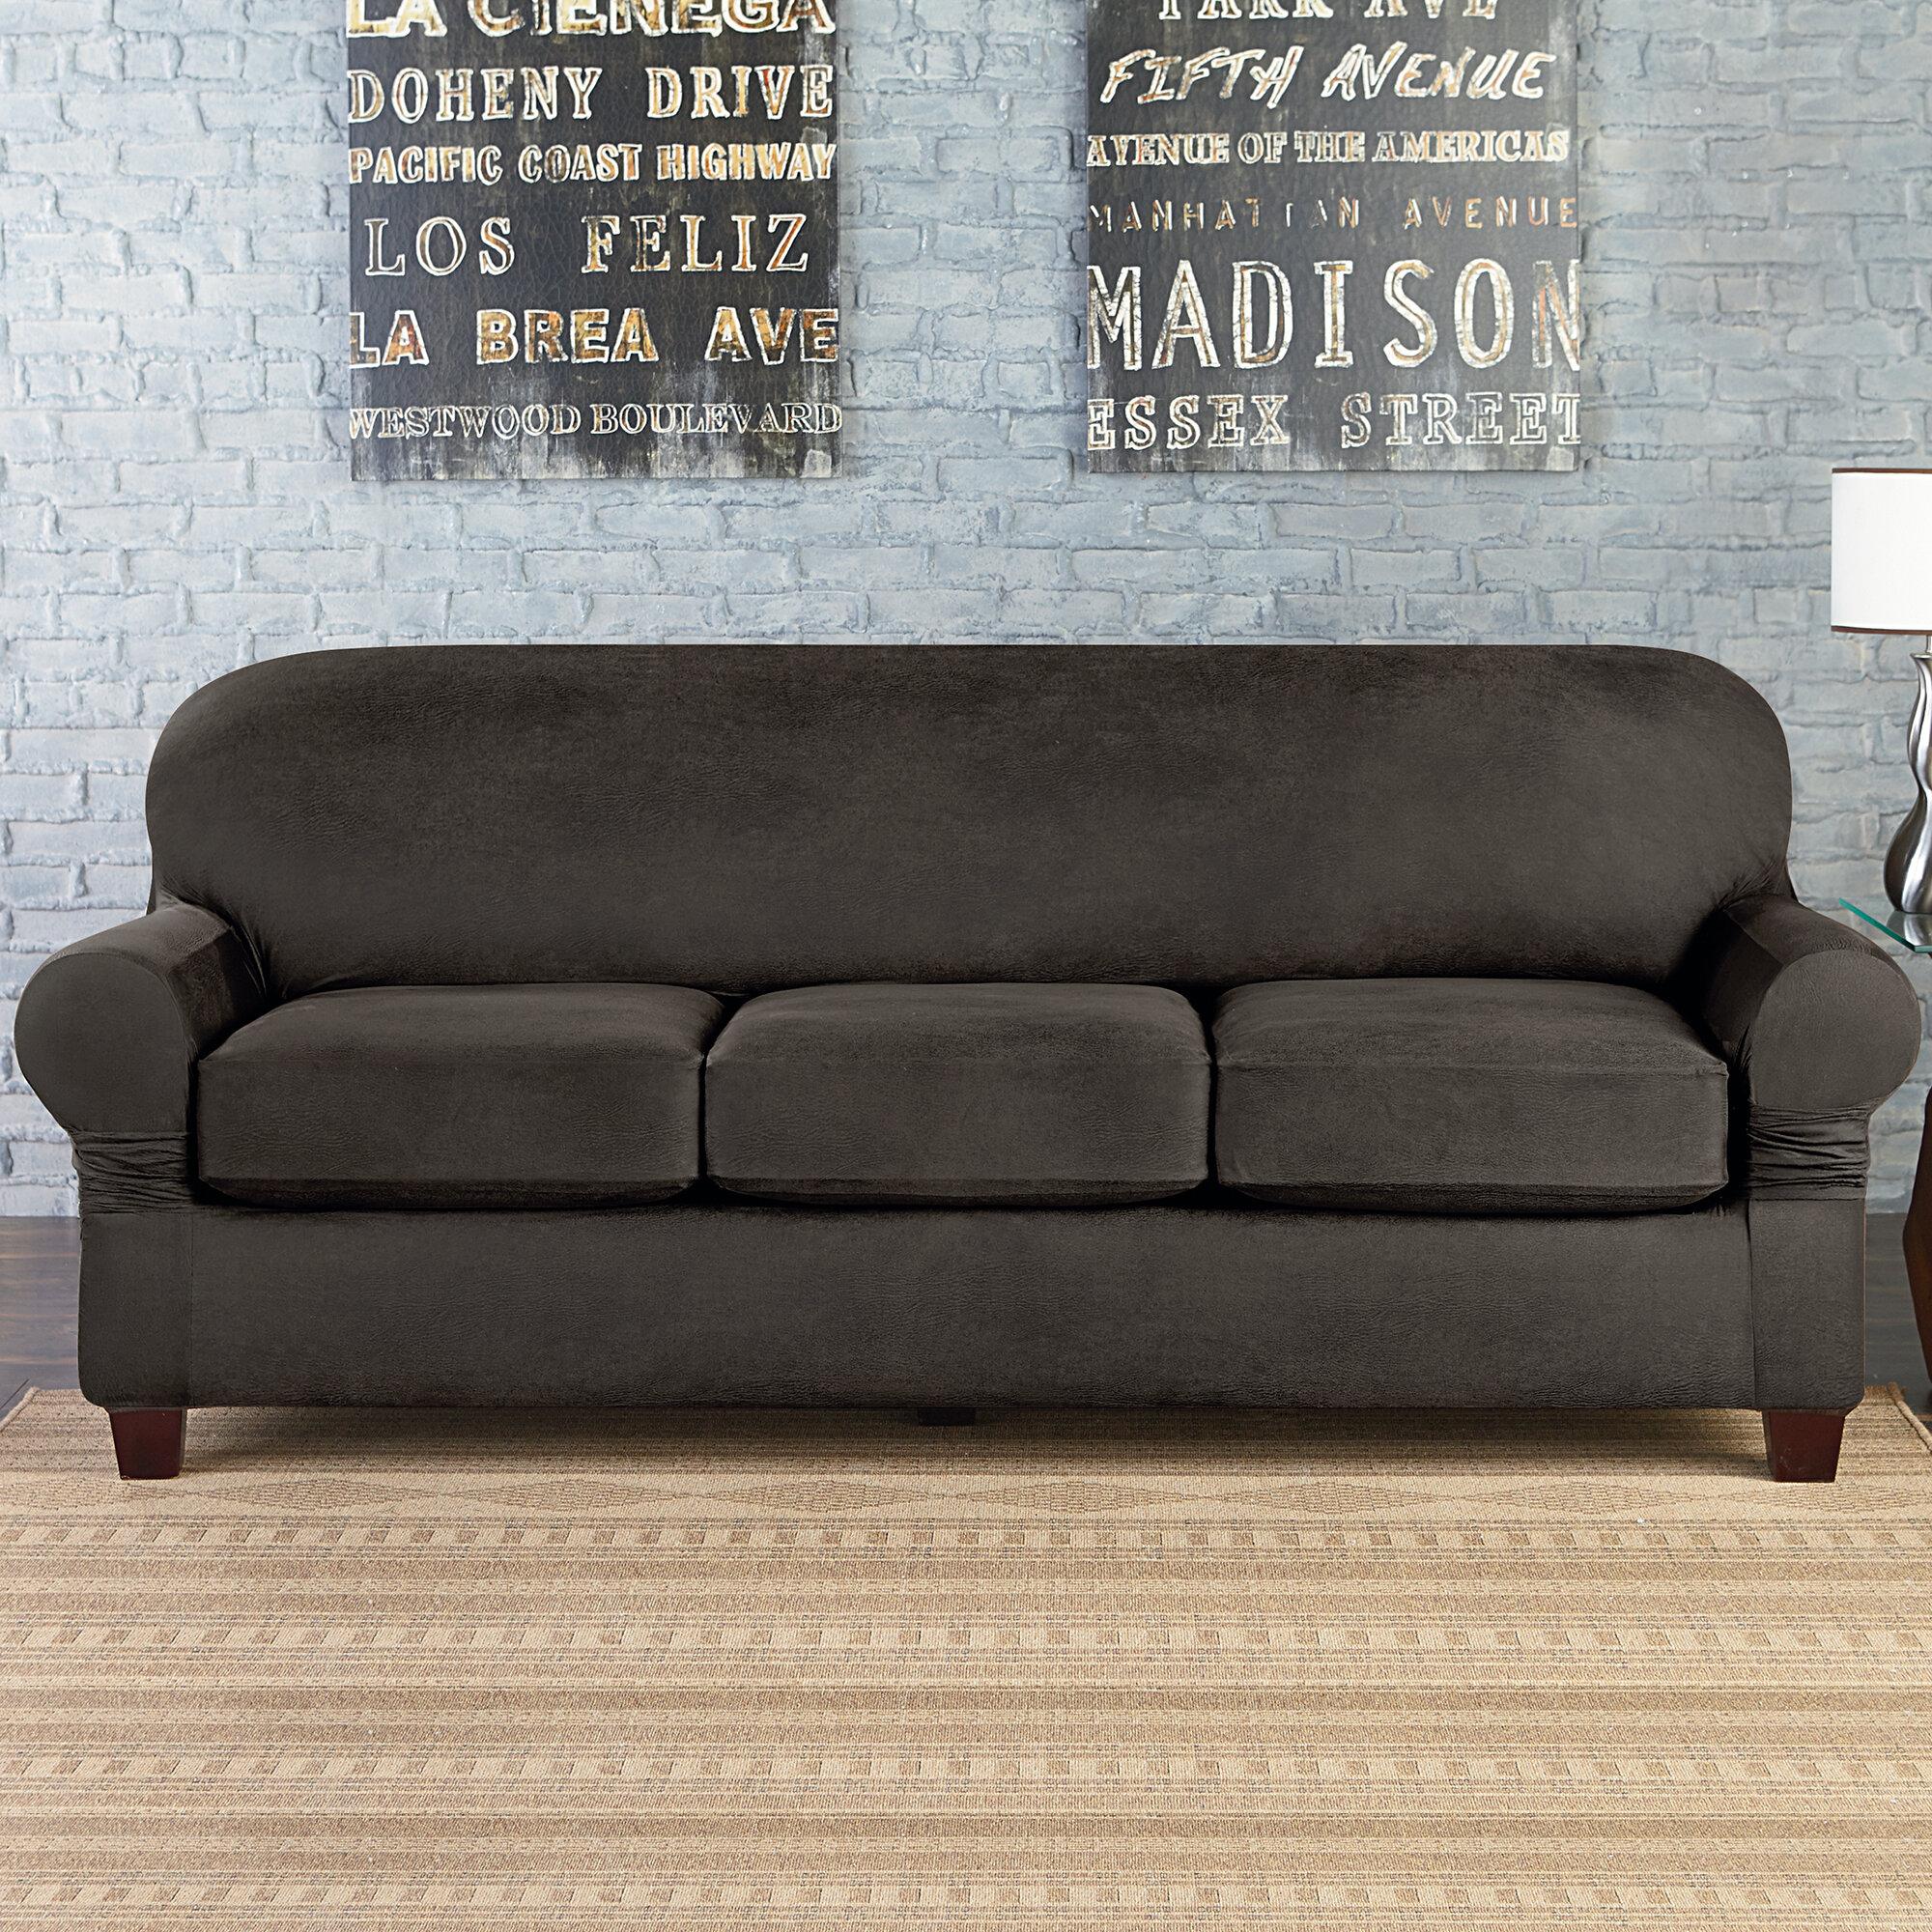 Sure Fit Vintage Leather Furniture